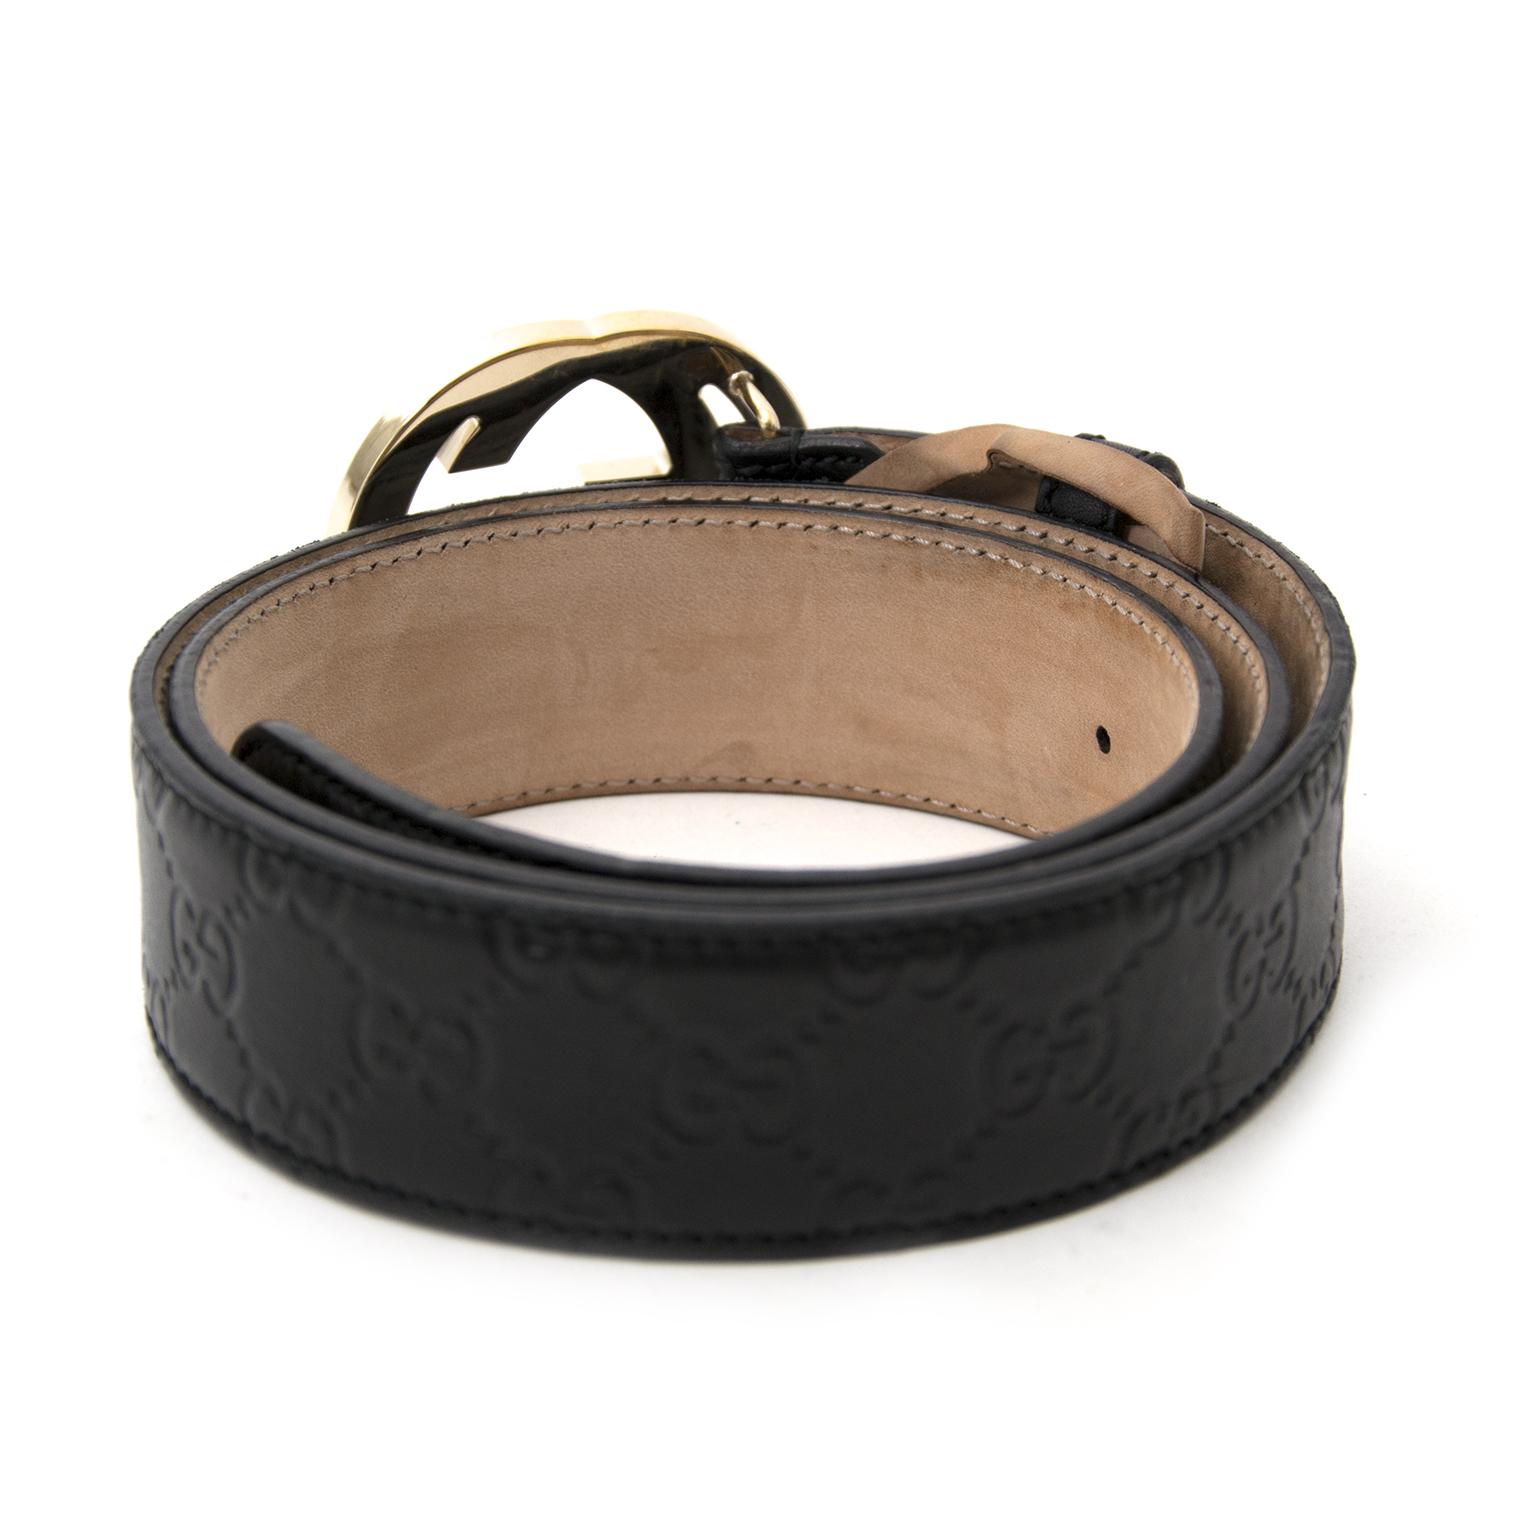 comme neuf sac a main Gucci Black Monogram GG Belt site enligne